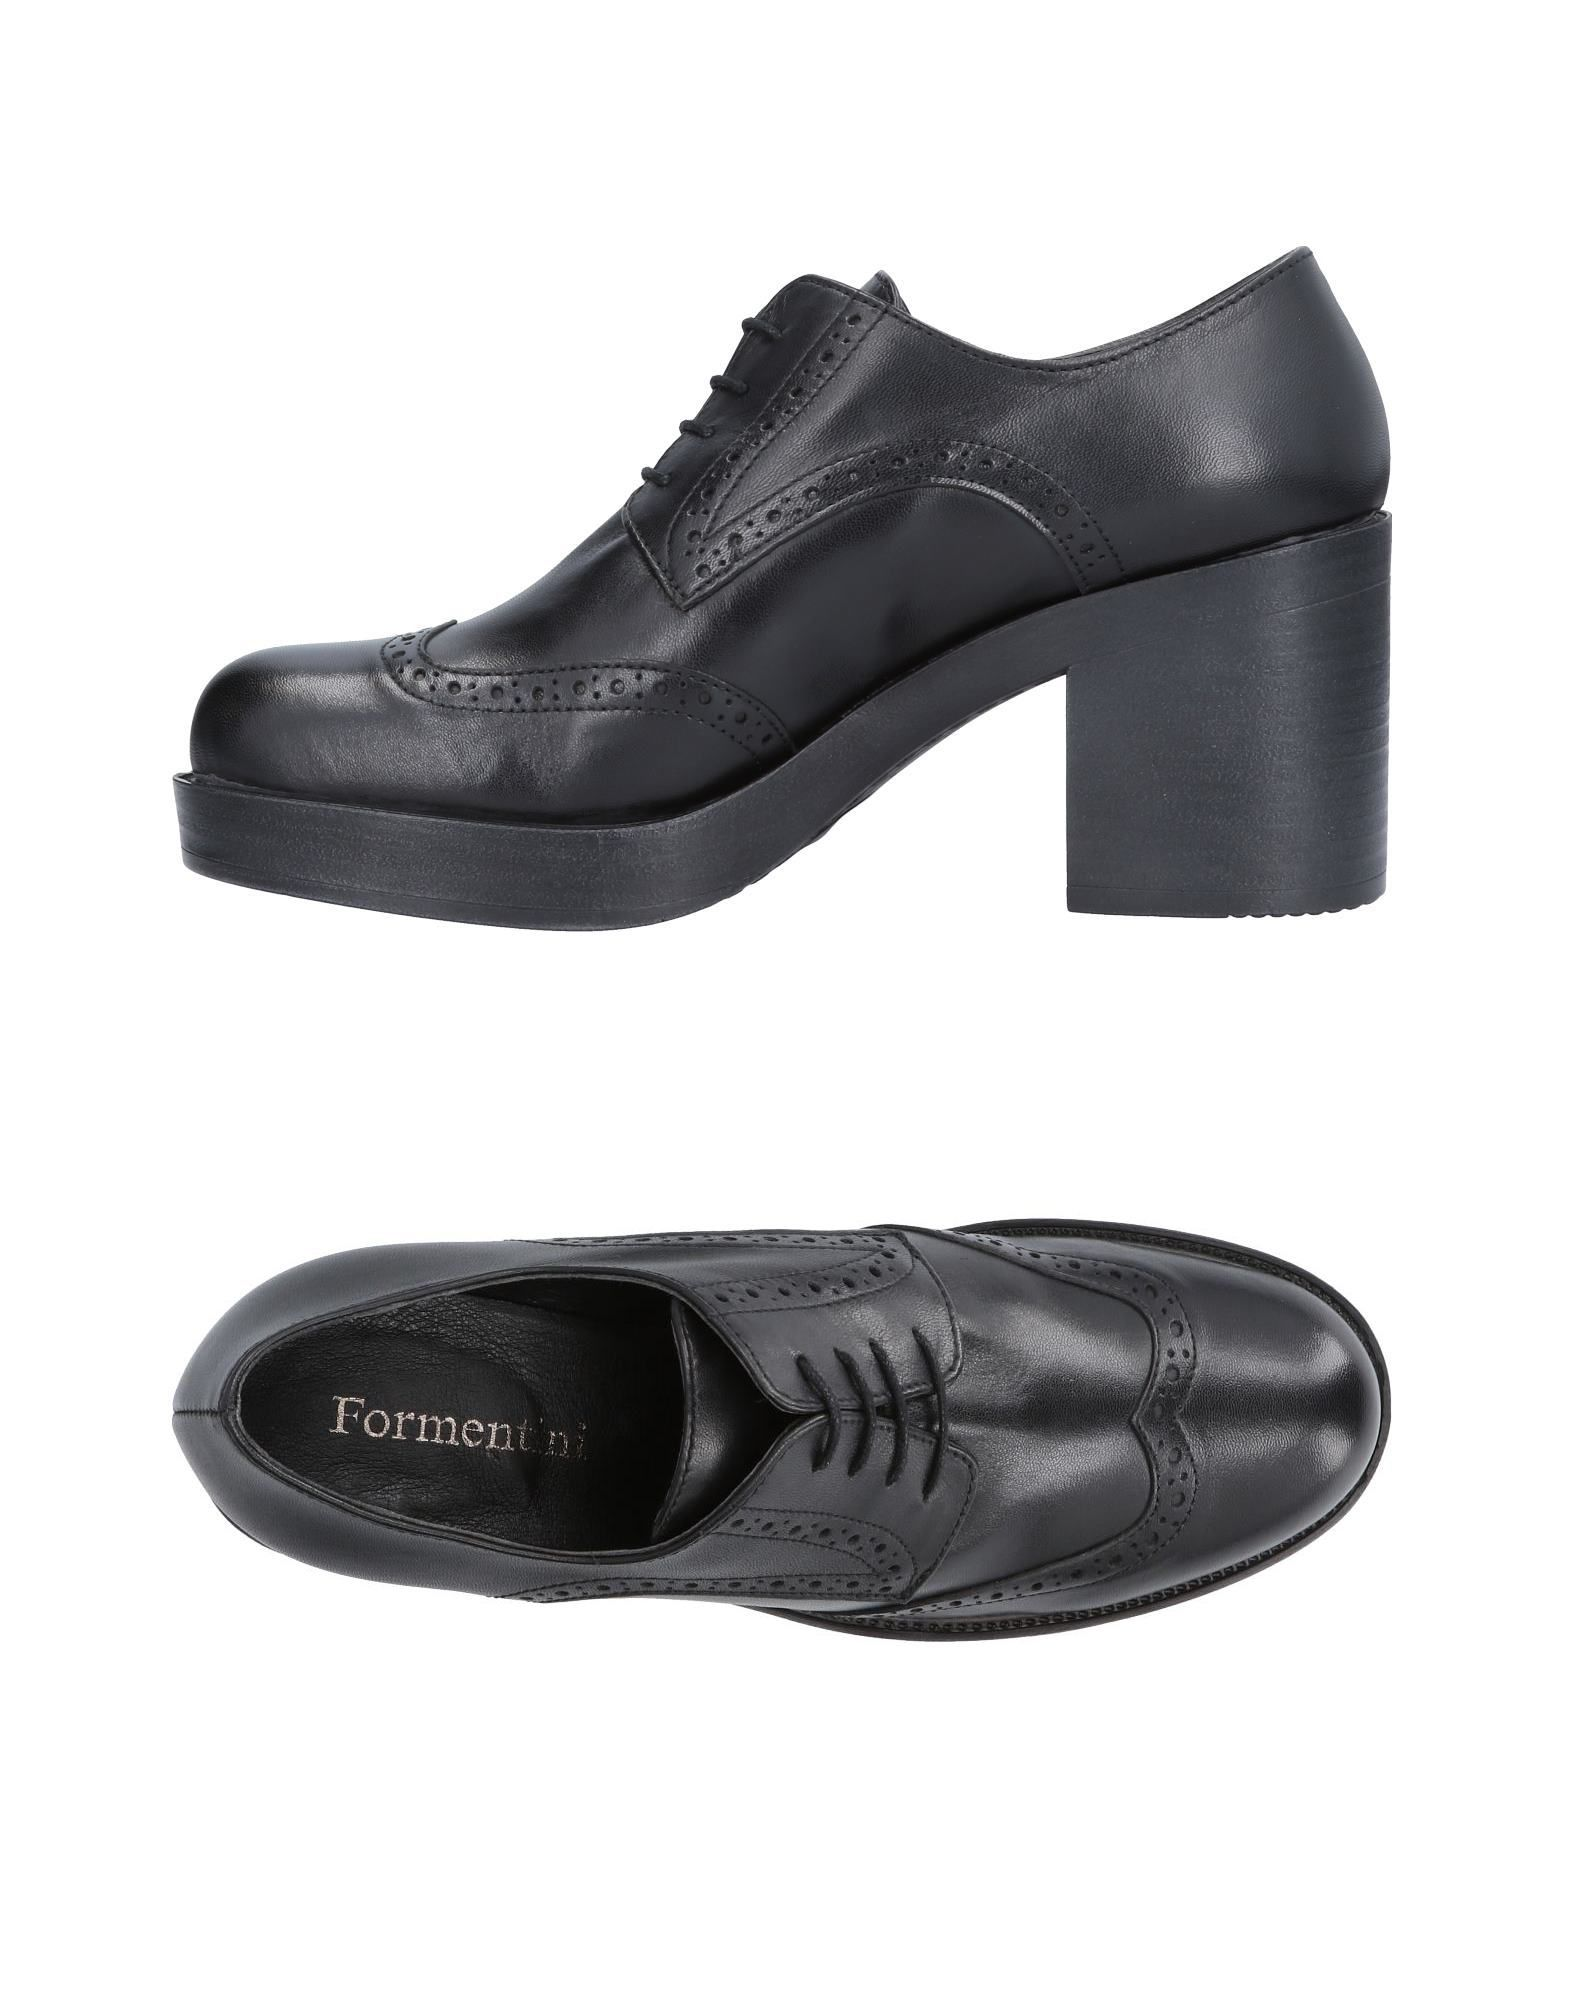 Formentini Schnürschuhe Damen beliebte  11479292FA Gute Qualität beliebte Damen Schuhe 1d80c1